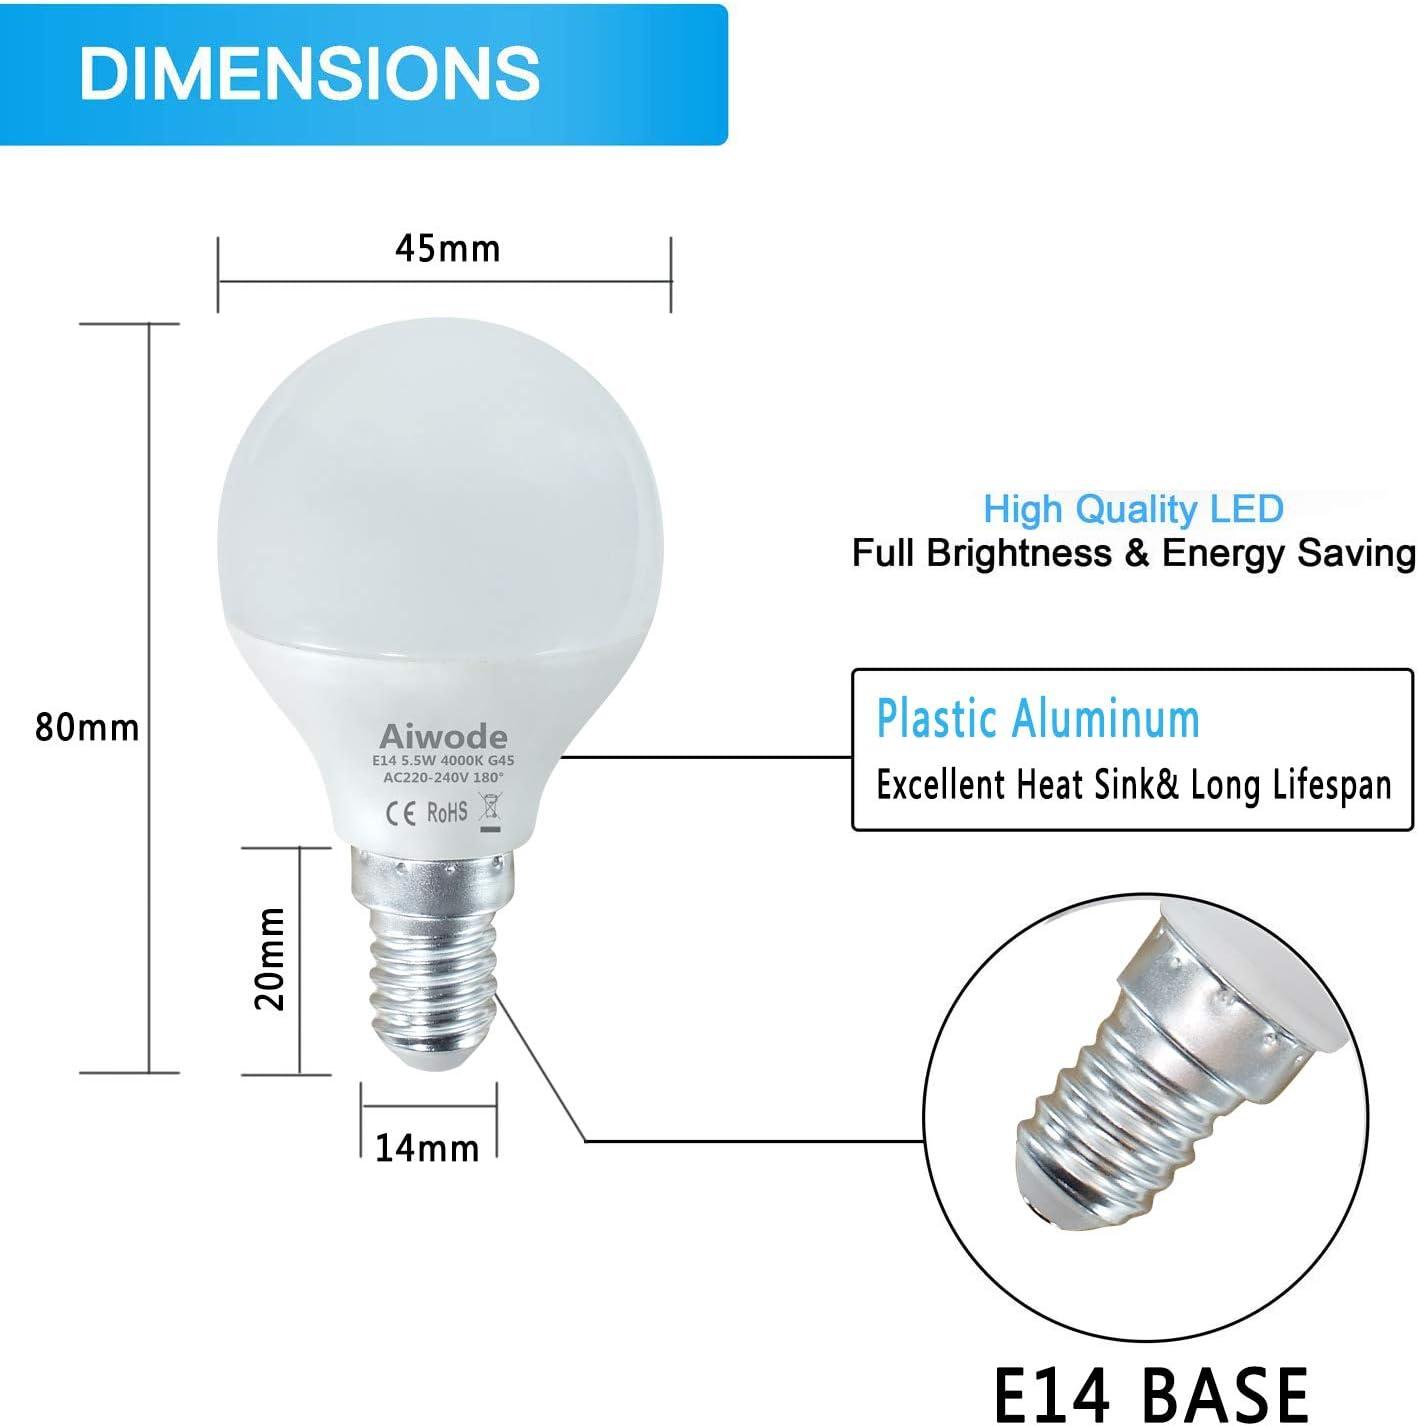 470LM C37 Leuchtmittel Ra80 180/°Abstrahlwinkel,6er Pack. Aiwode 5.5W E27 LED Lampe Kerzenleuchten,Naturwei/ß 4000K,Ersetz 40W Halogen-Gl/ühlampe